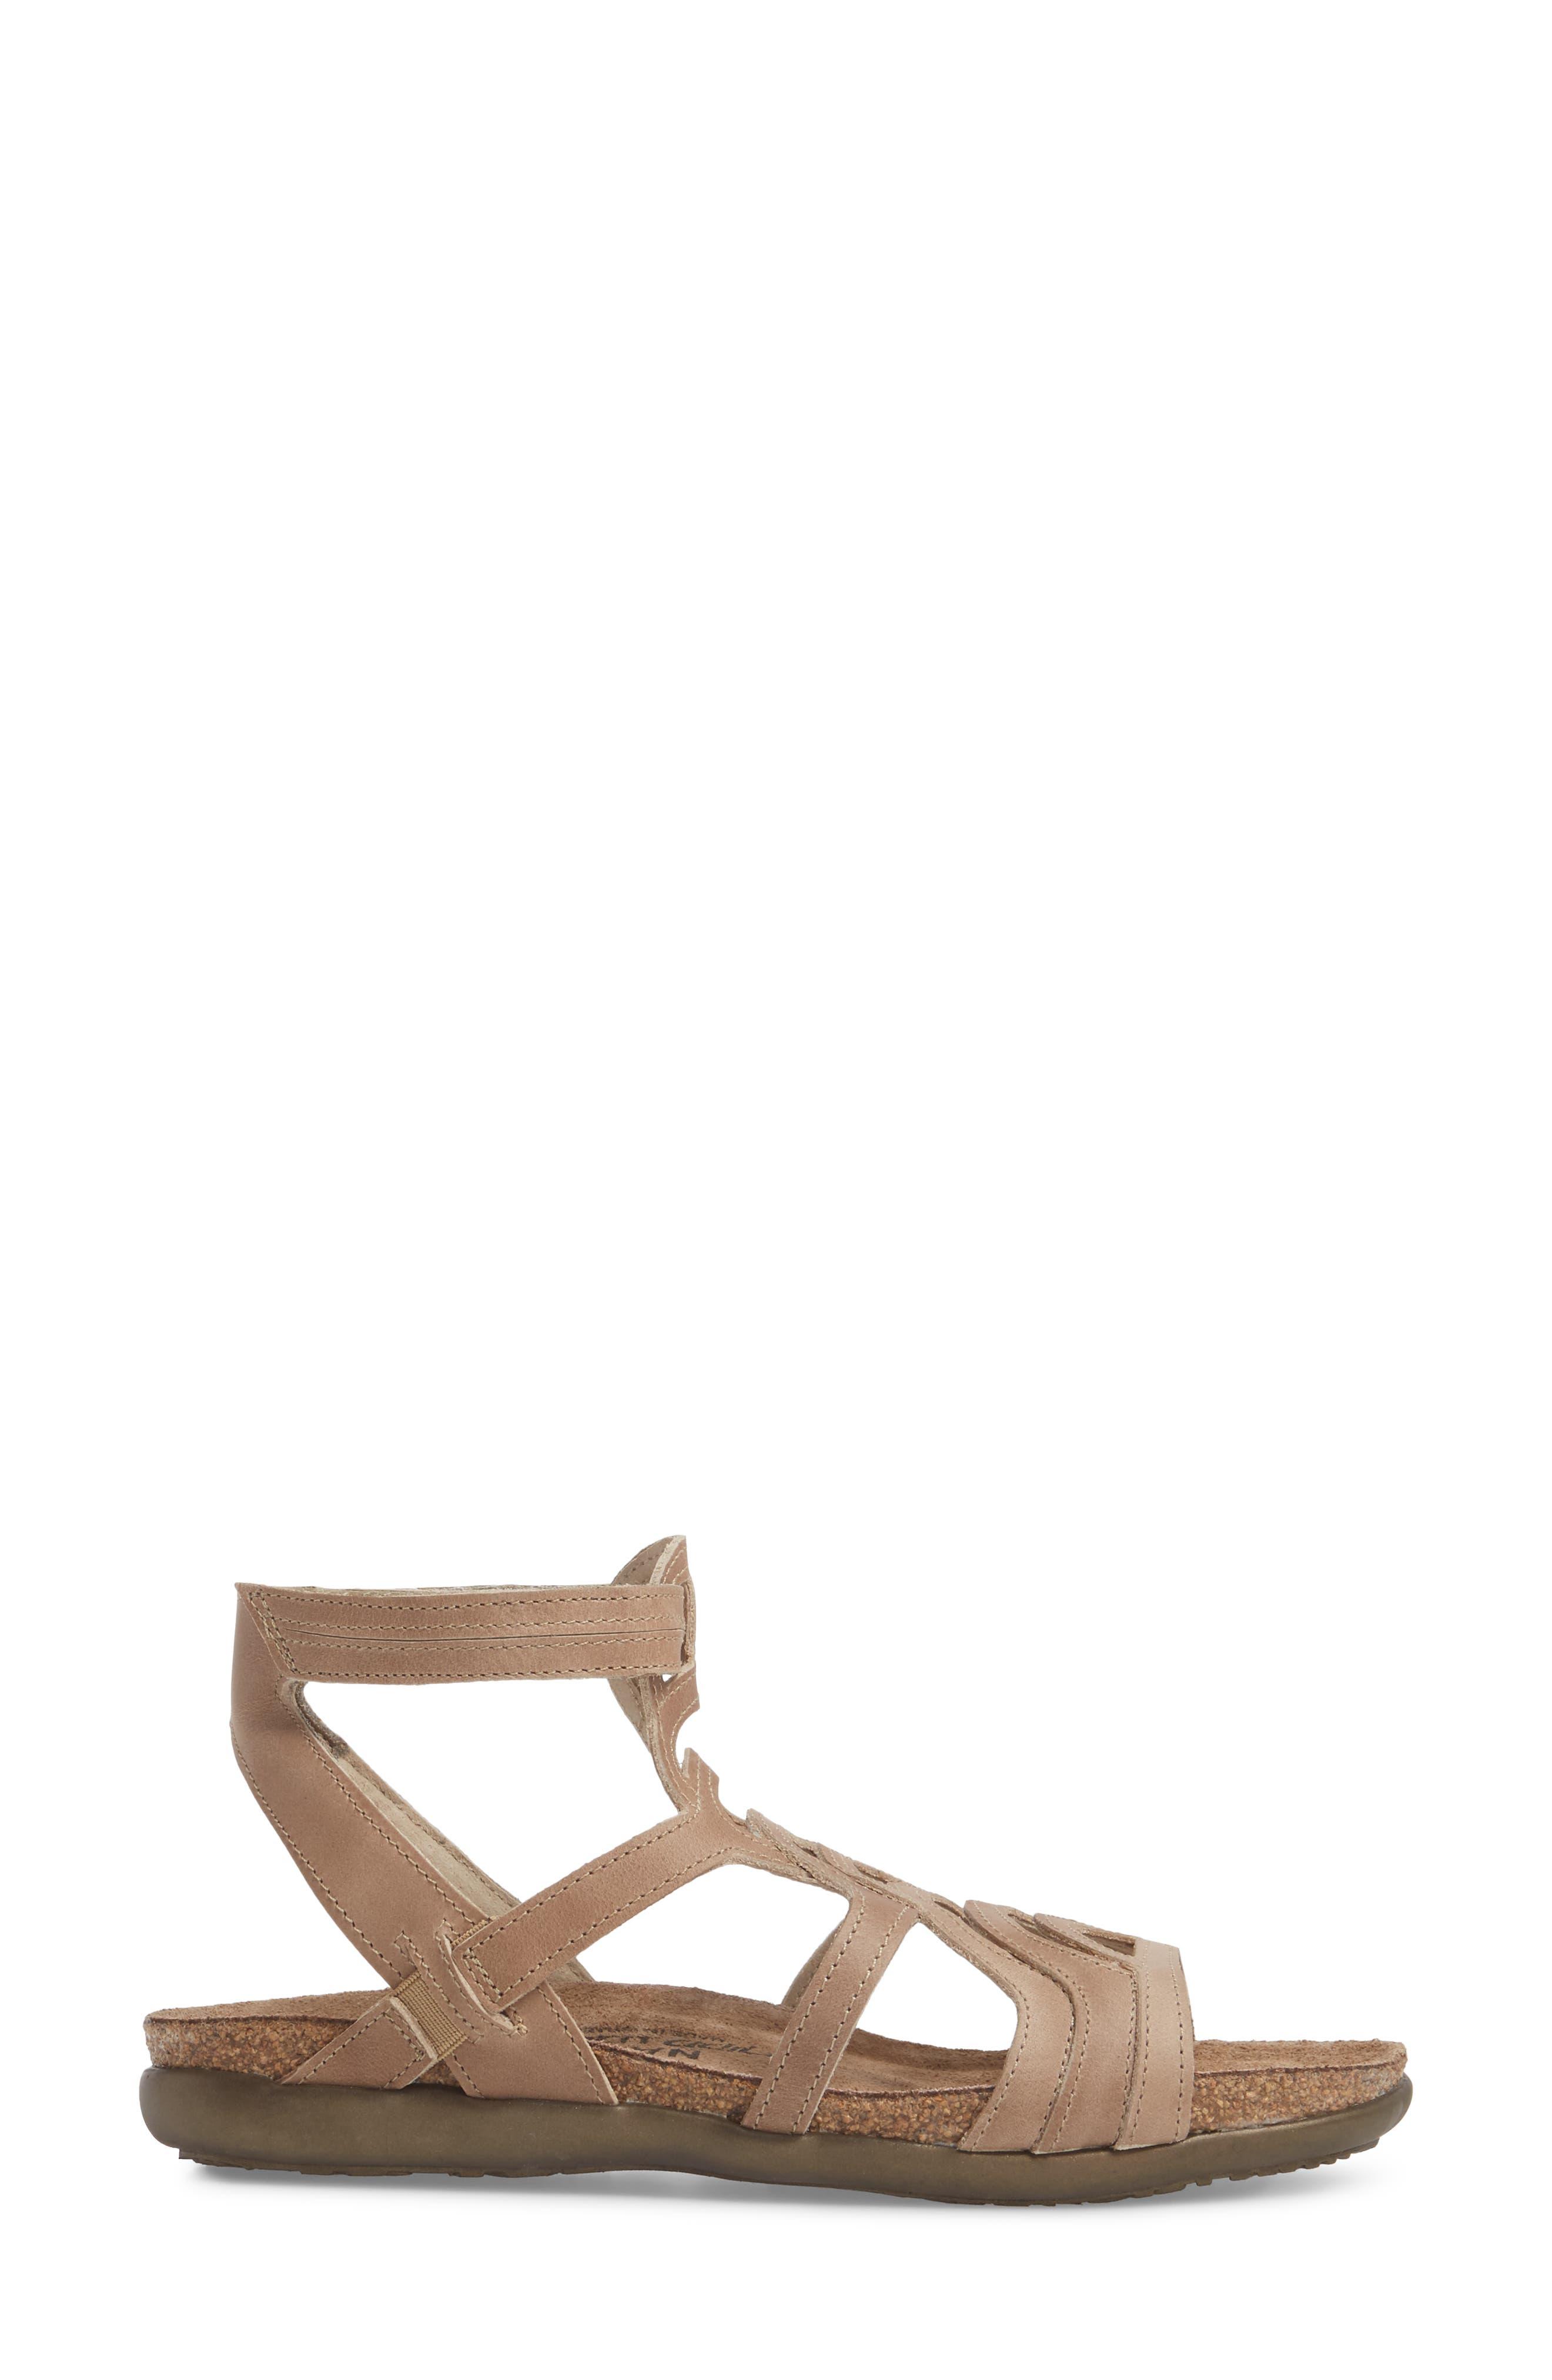 'Sara' Gladiator Sandal,                             Alternate thumbnail 3, color,                             Khaki Beige Leather